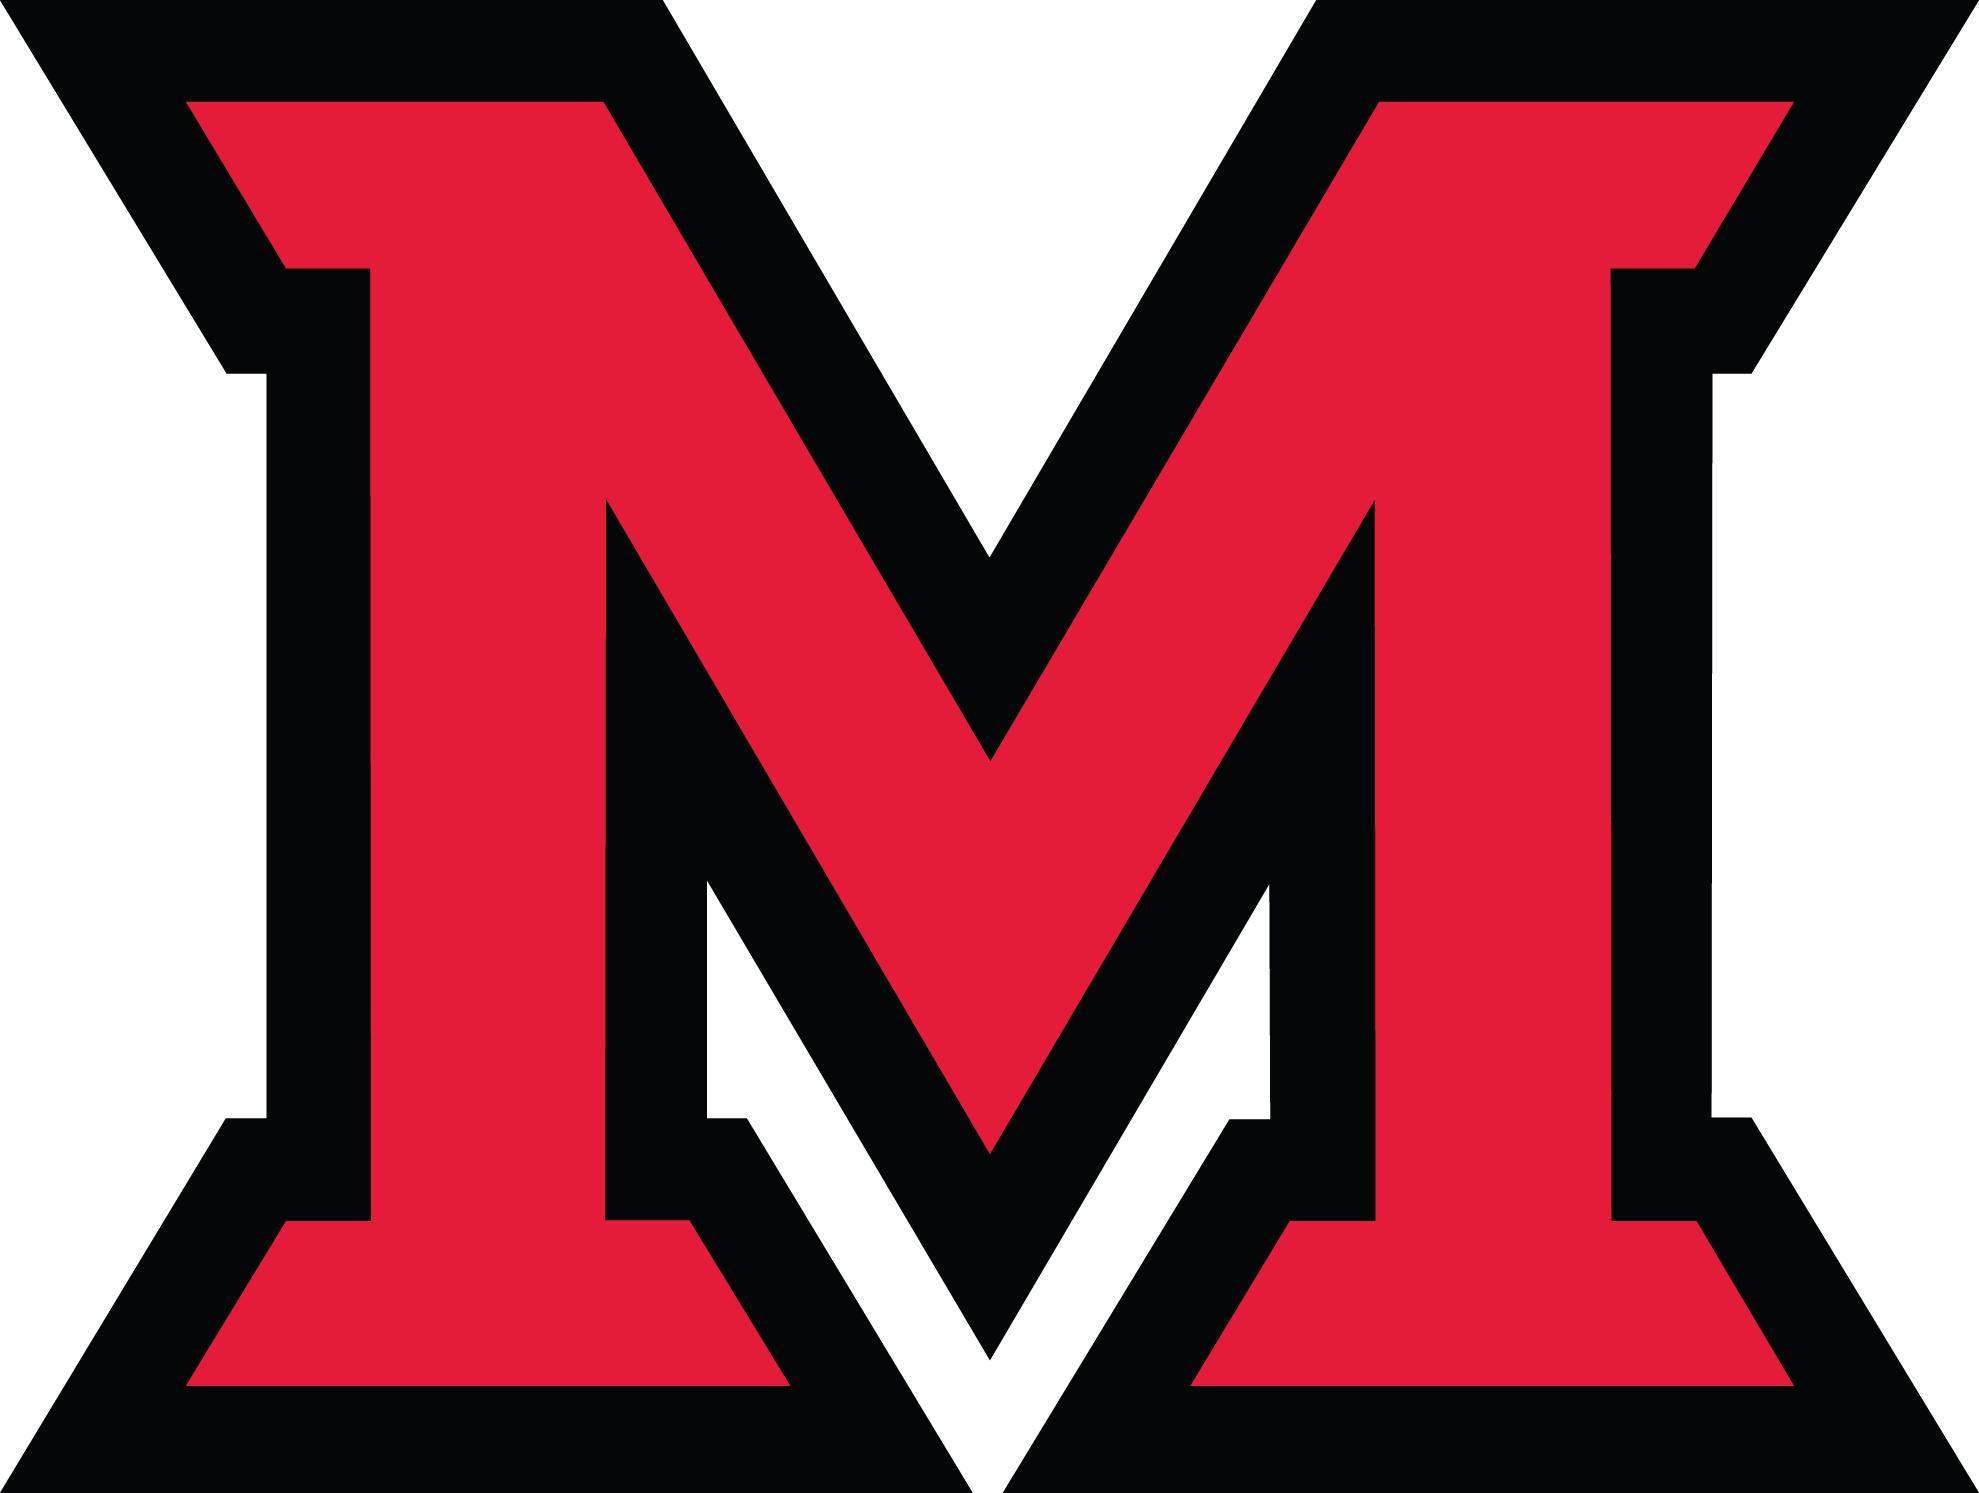 M&m clipart symbol Zone Cliparts M Cliparts M&M